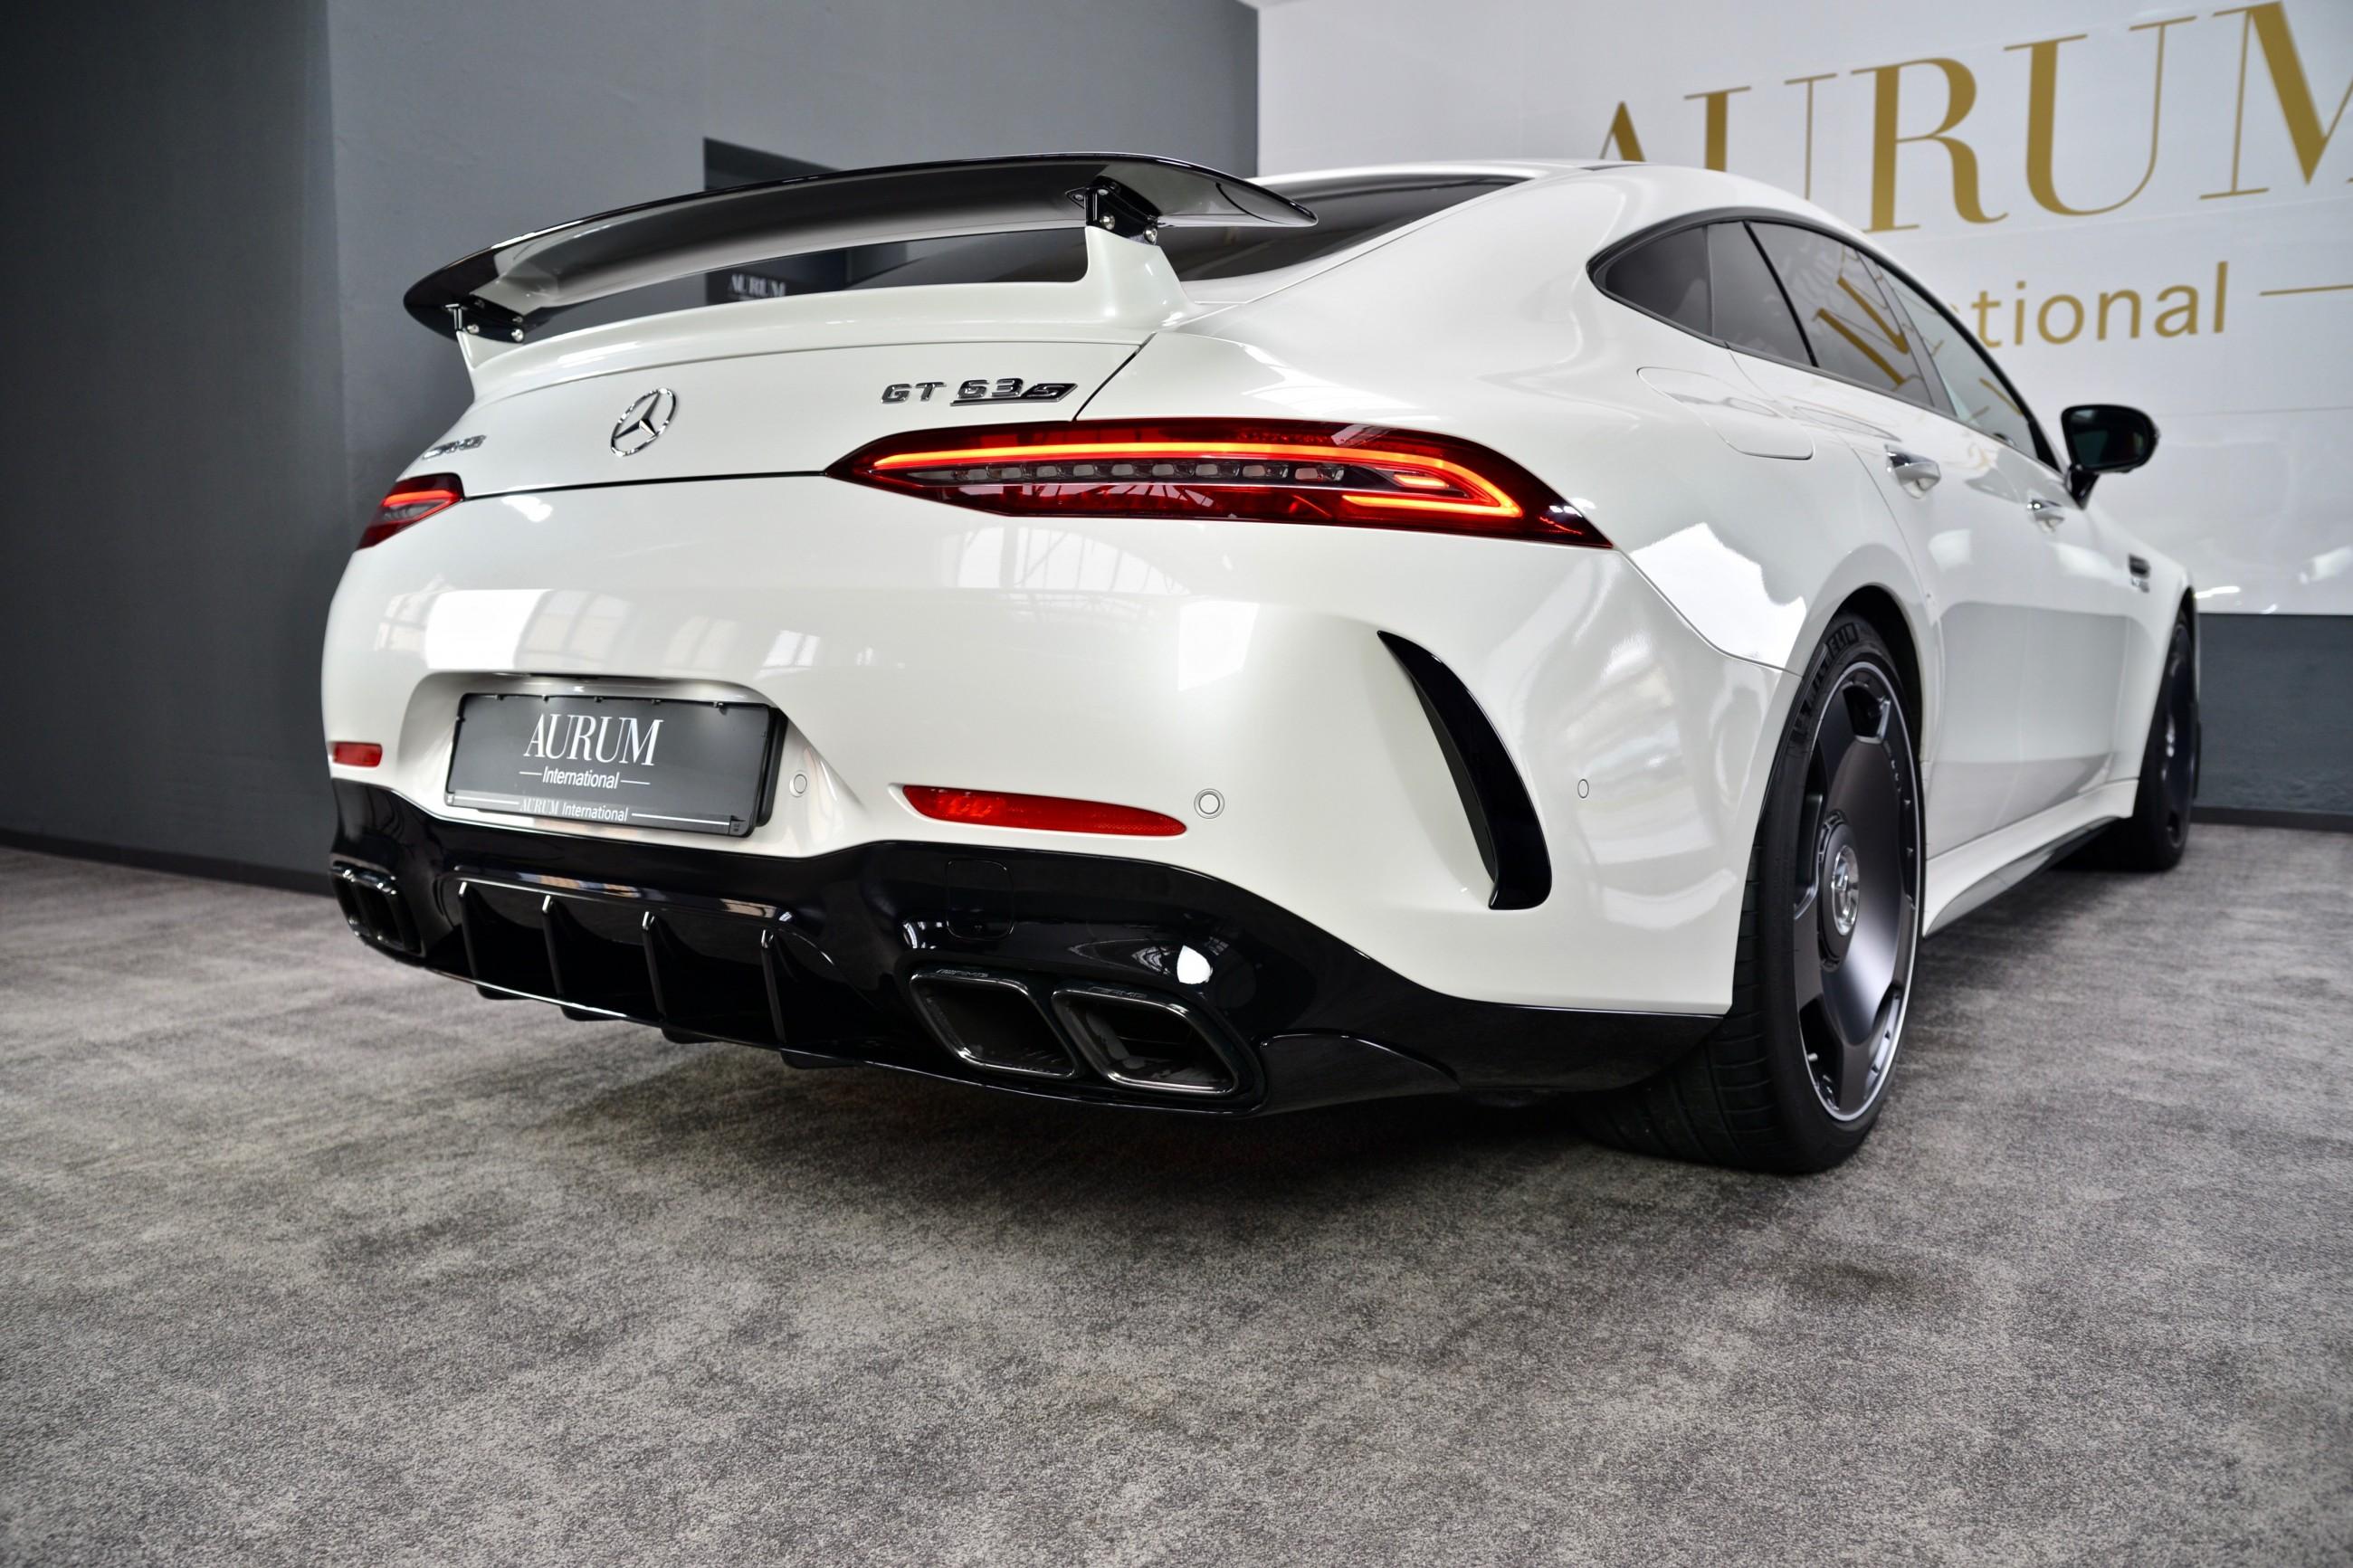 Mercedes-Benz AMG GT 63 S 4MATIC KERAMIK - Luxury Pulse ...